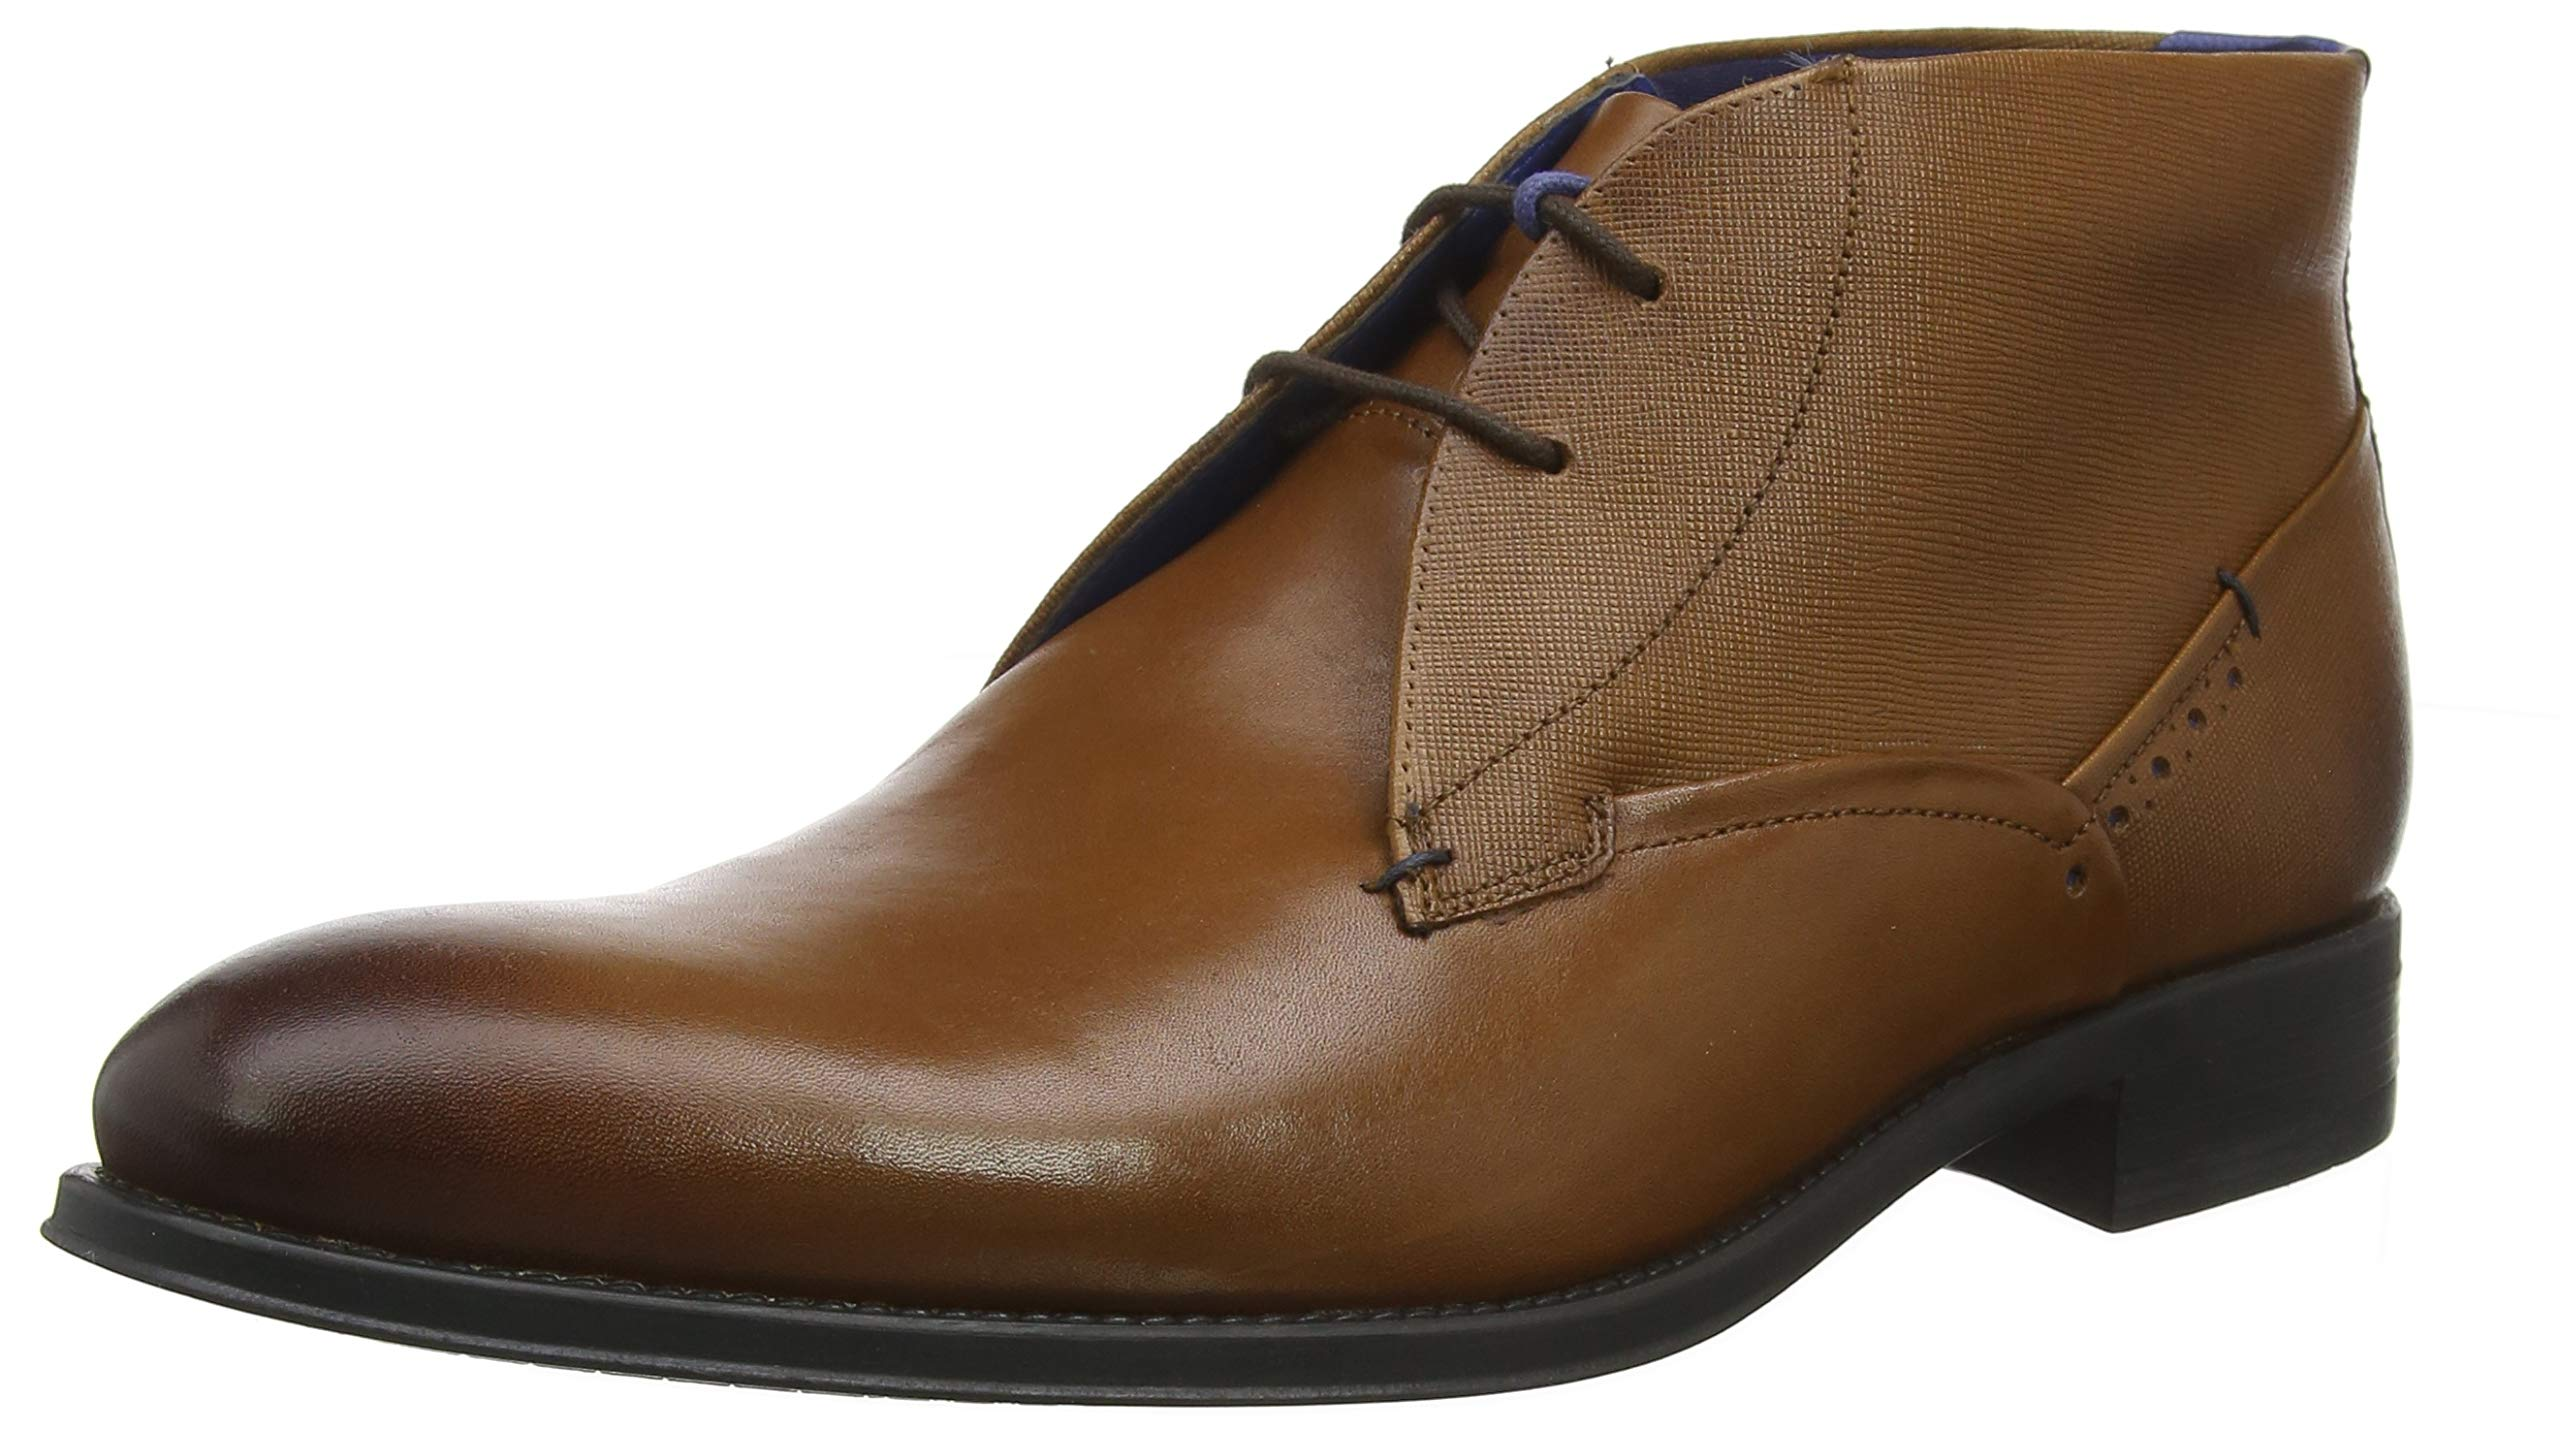 Ted Baker London Men's Chemna Chukka Boots